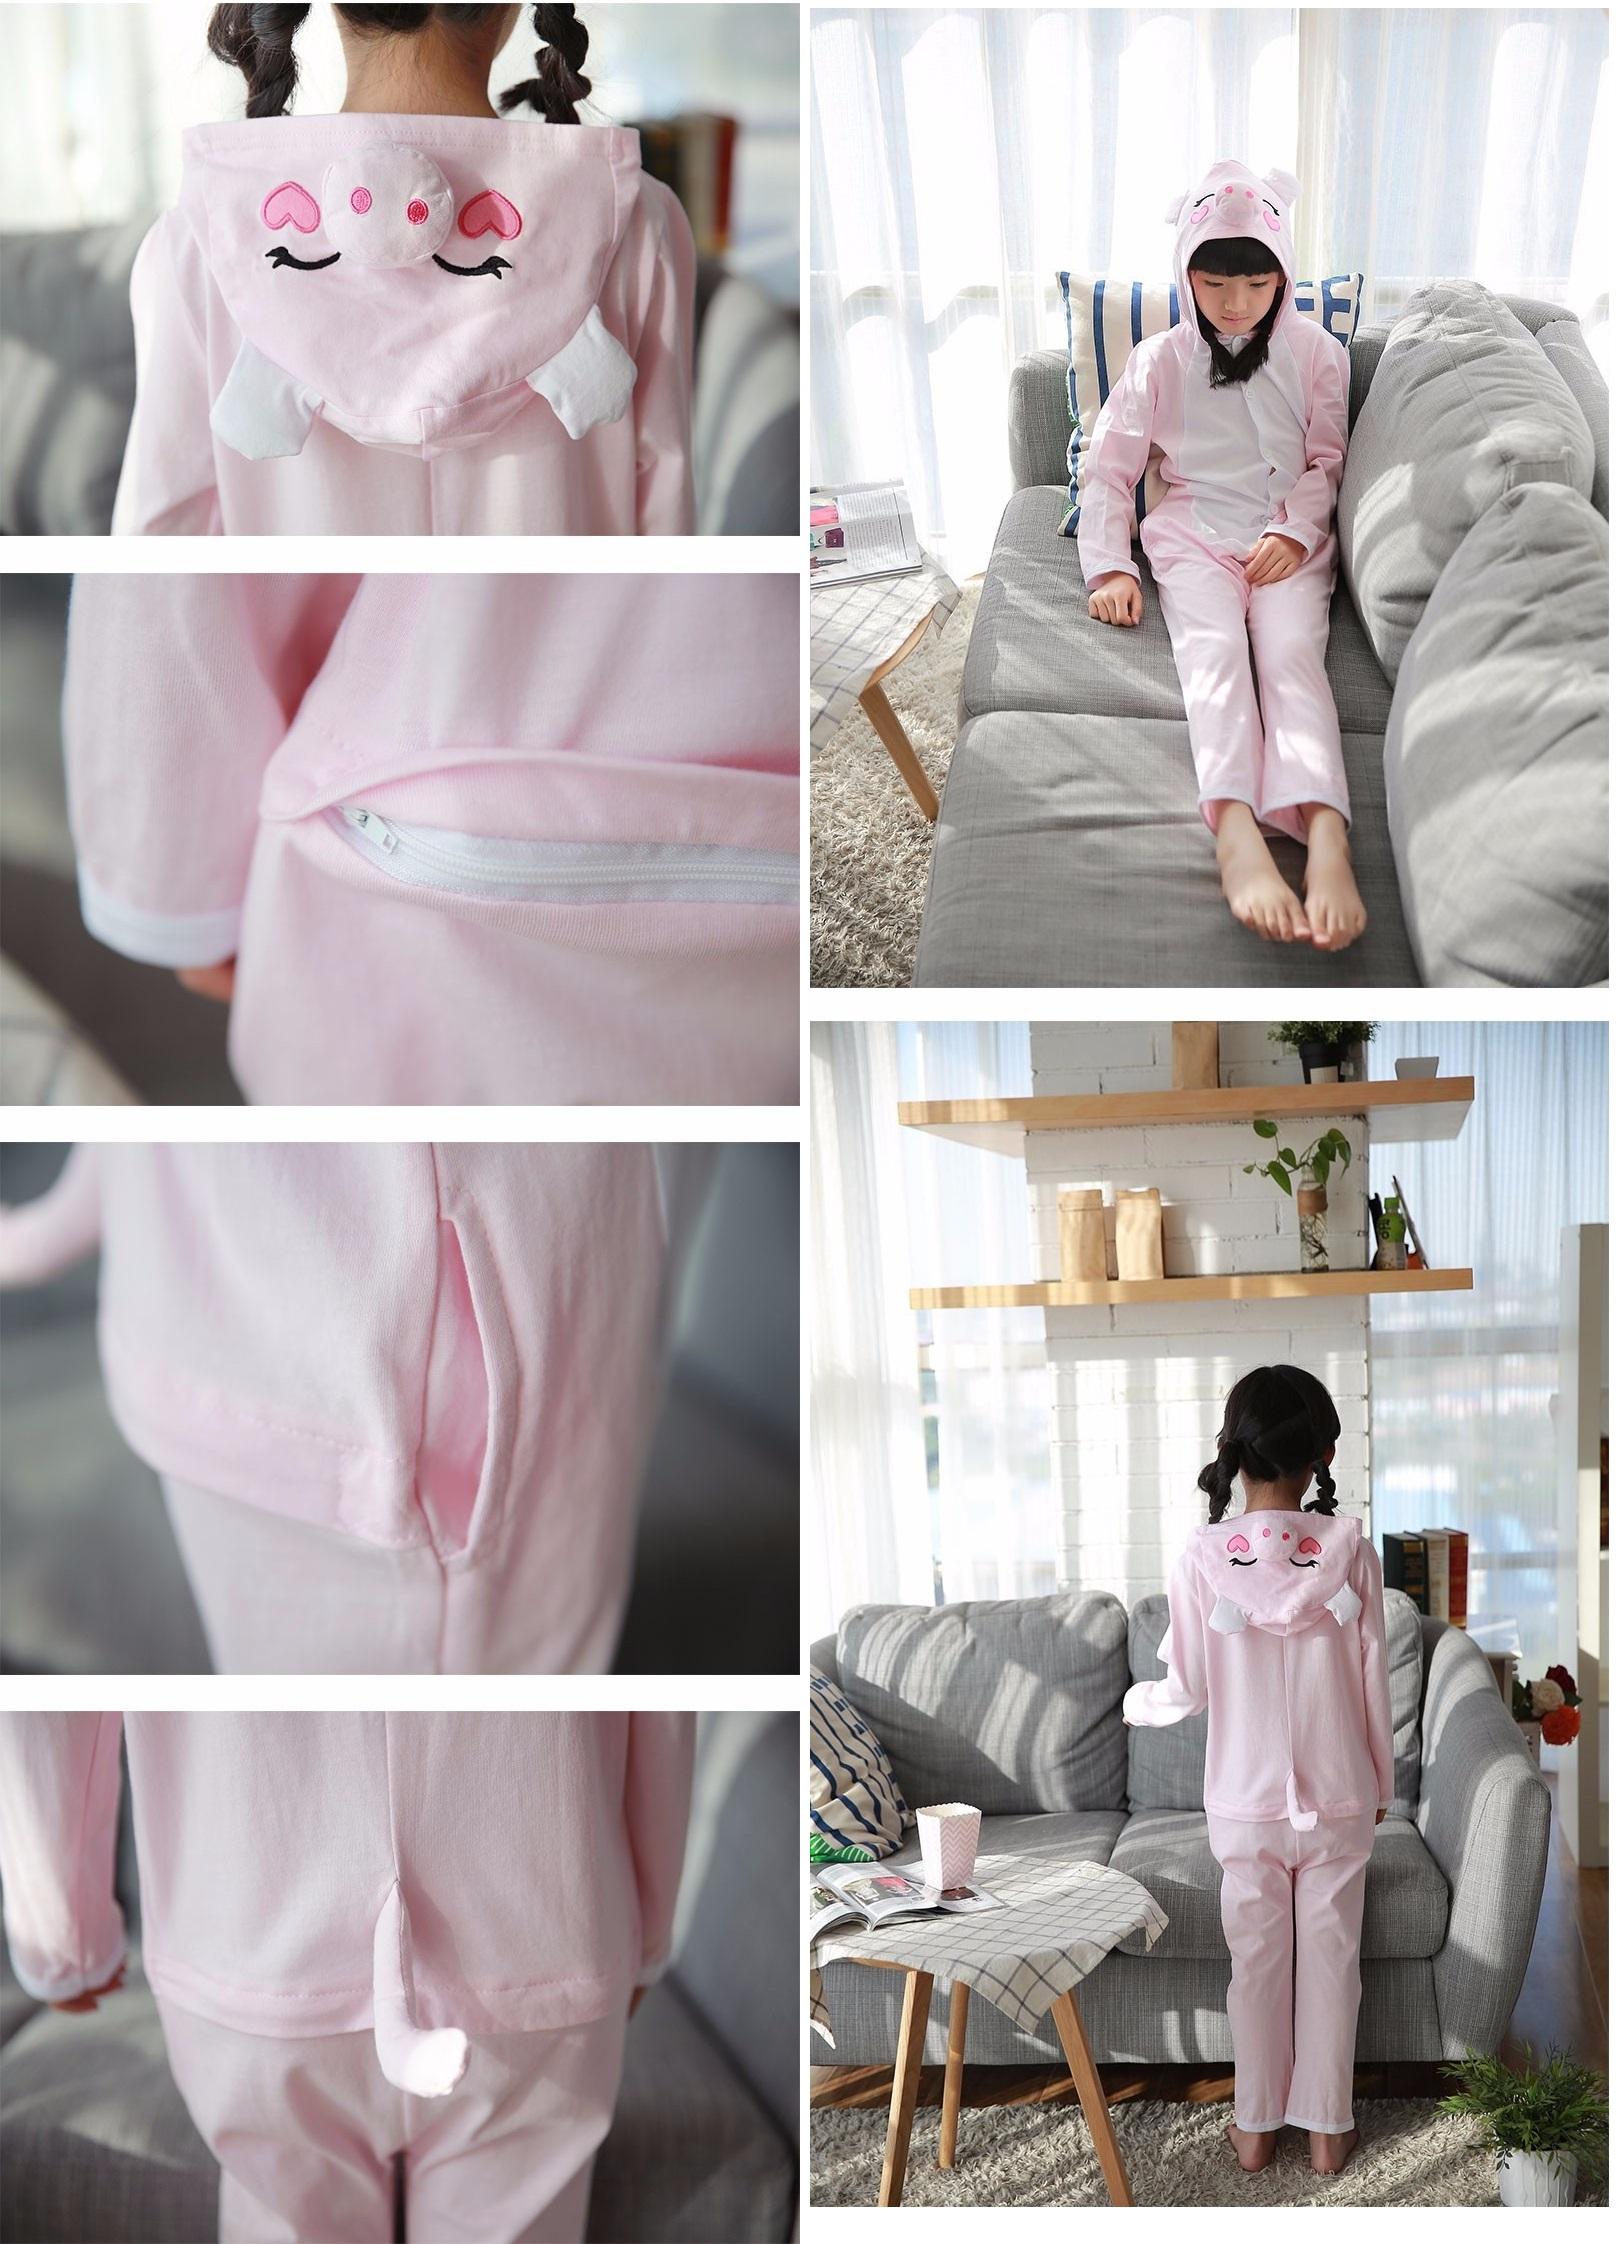 Pijama Completo de Cerdito para niñas